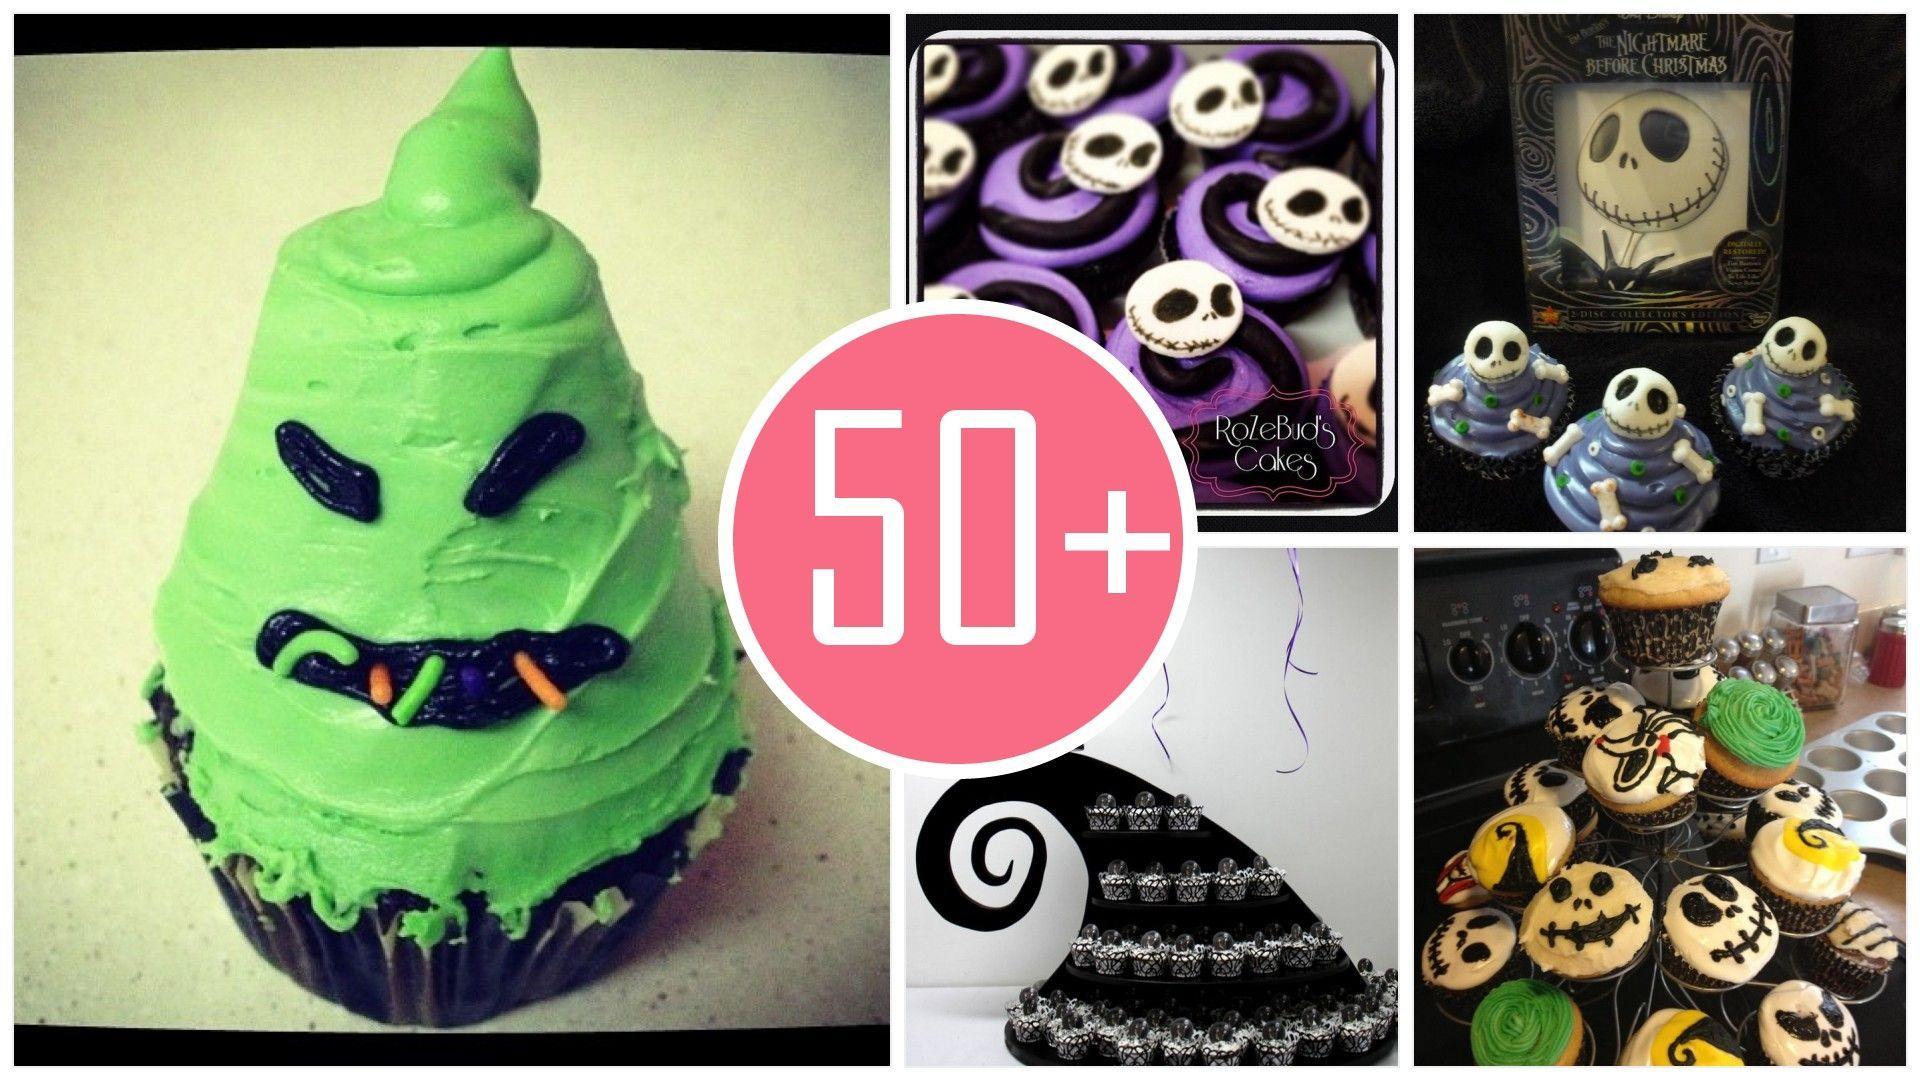 2014 Halloween nightmare before Christmas cupcake ideas that you ...